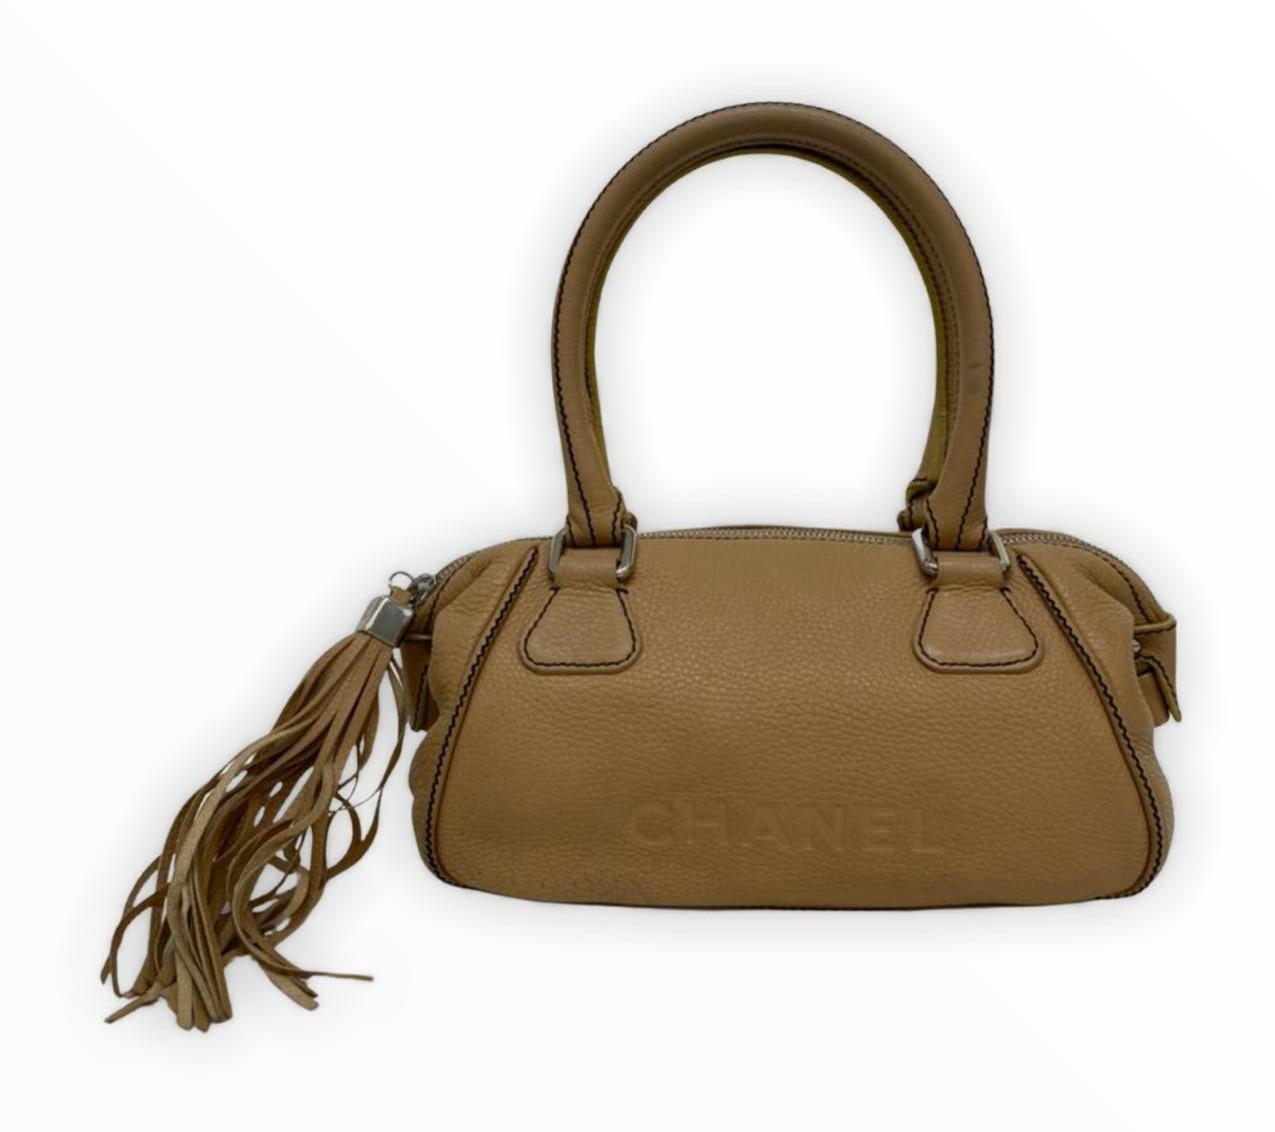 Bolsa Chanel Tote